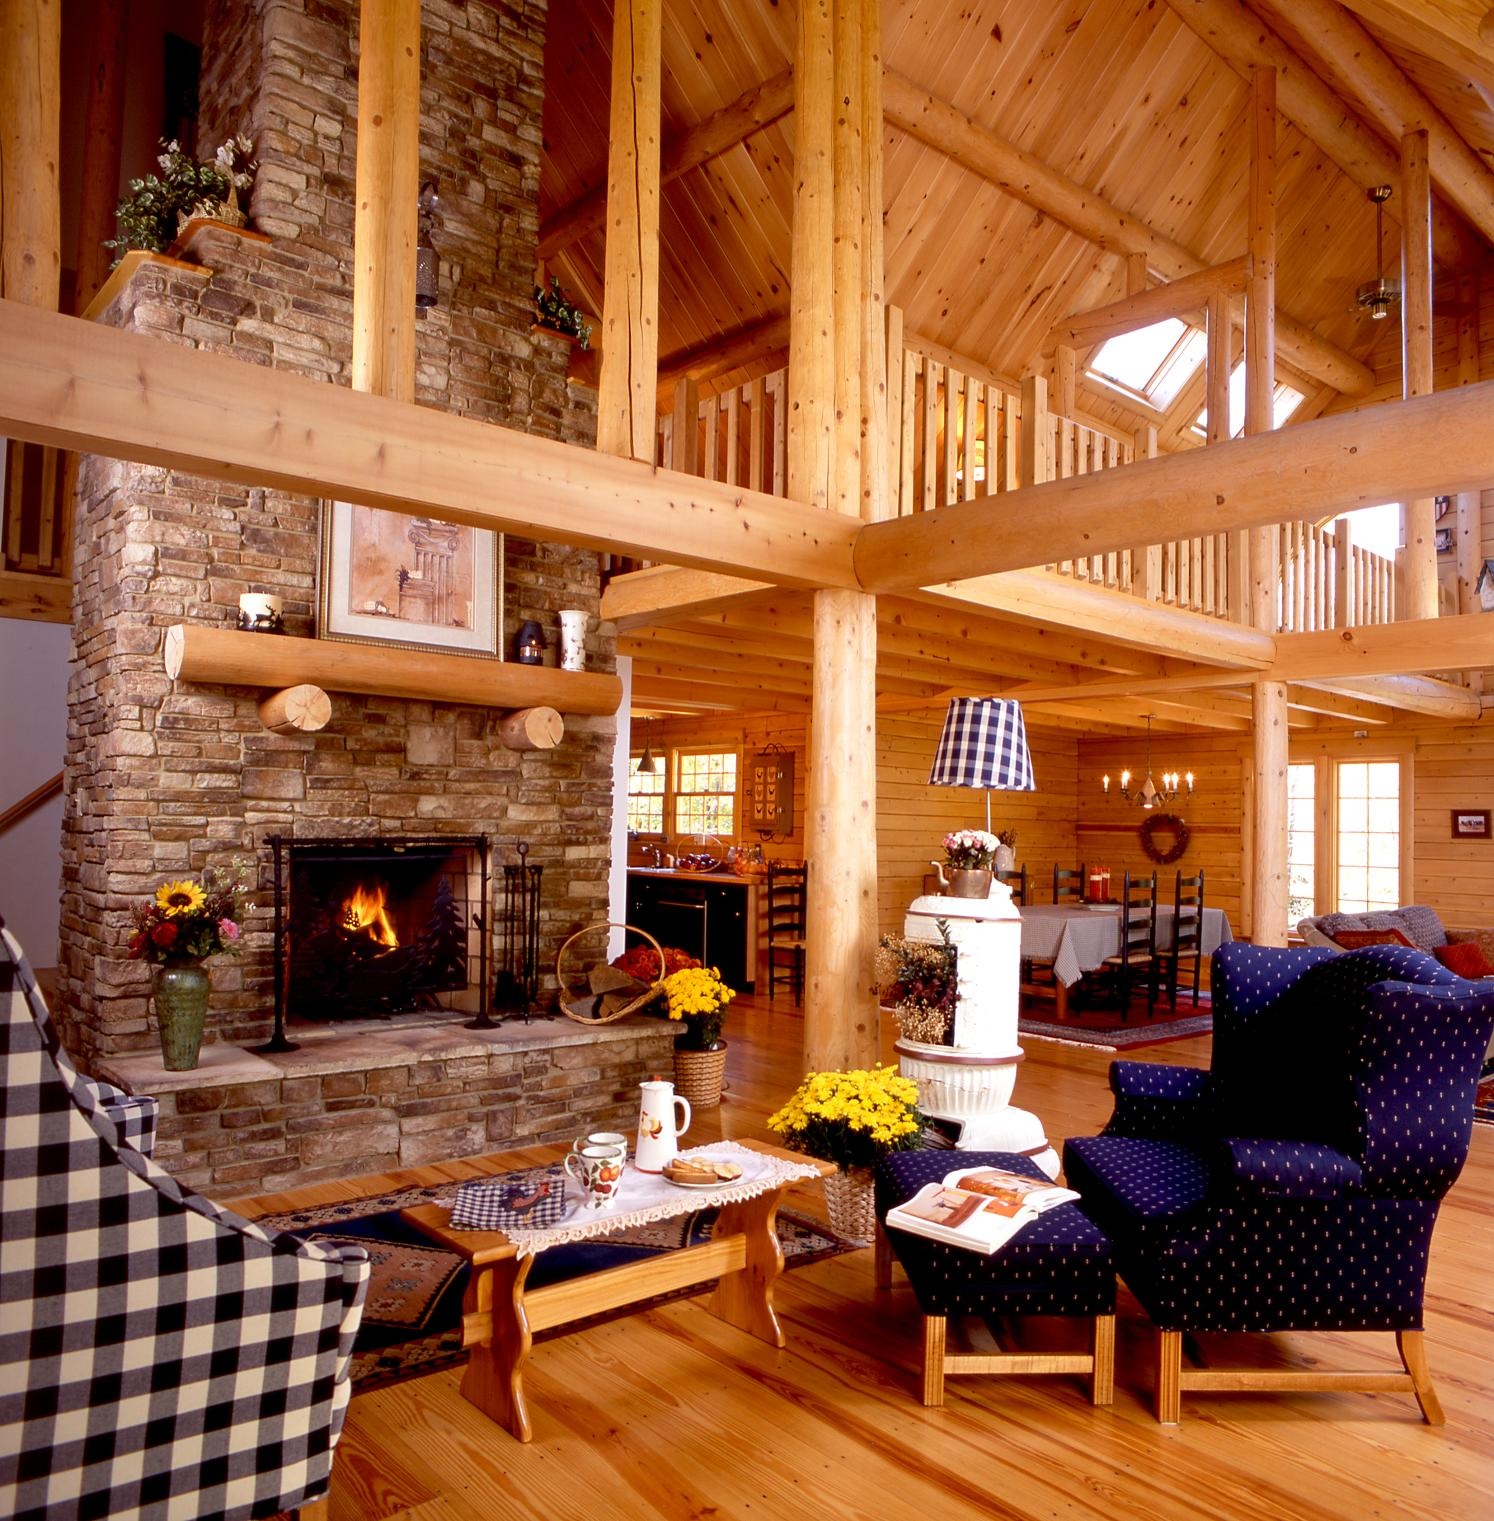 cedar home designs. log cabin home designs  Log Cabin Home Designs Small Modern House Plan